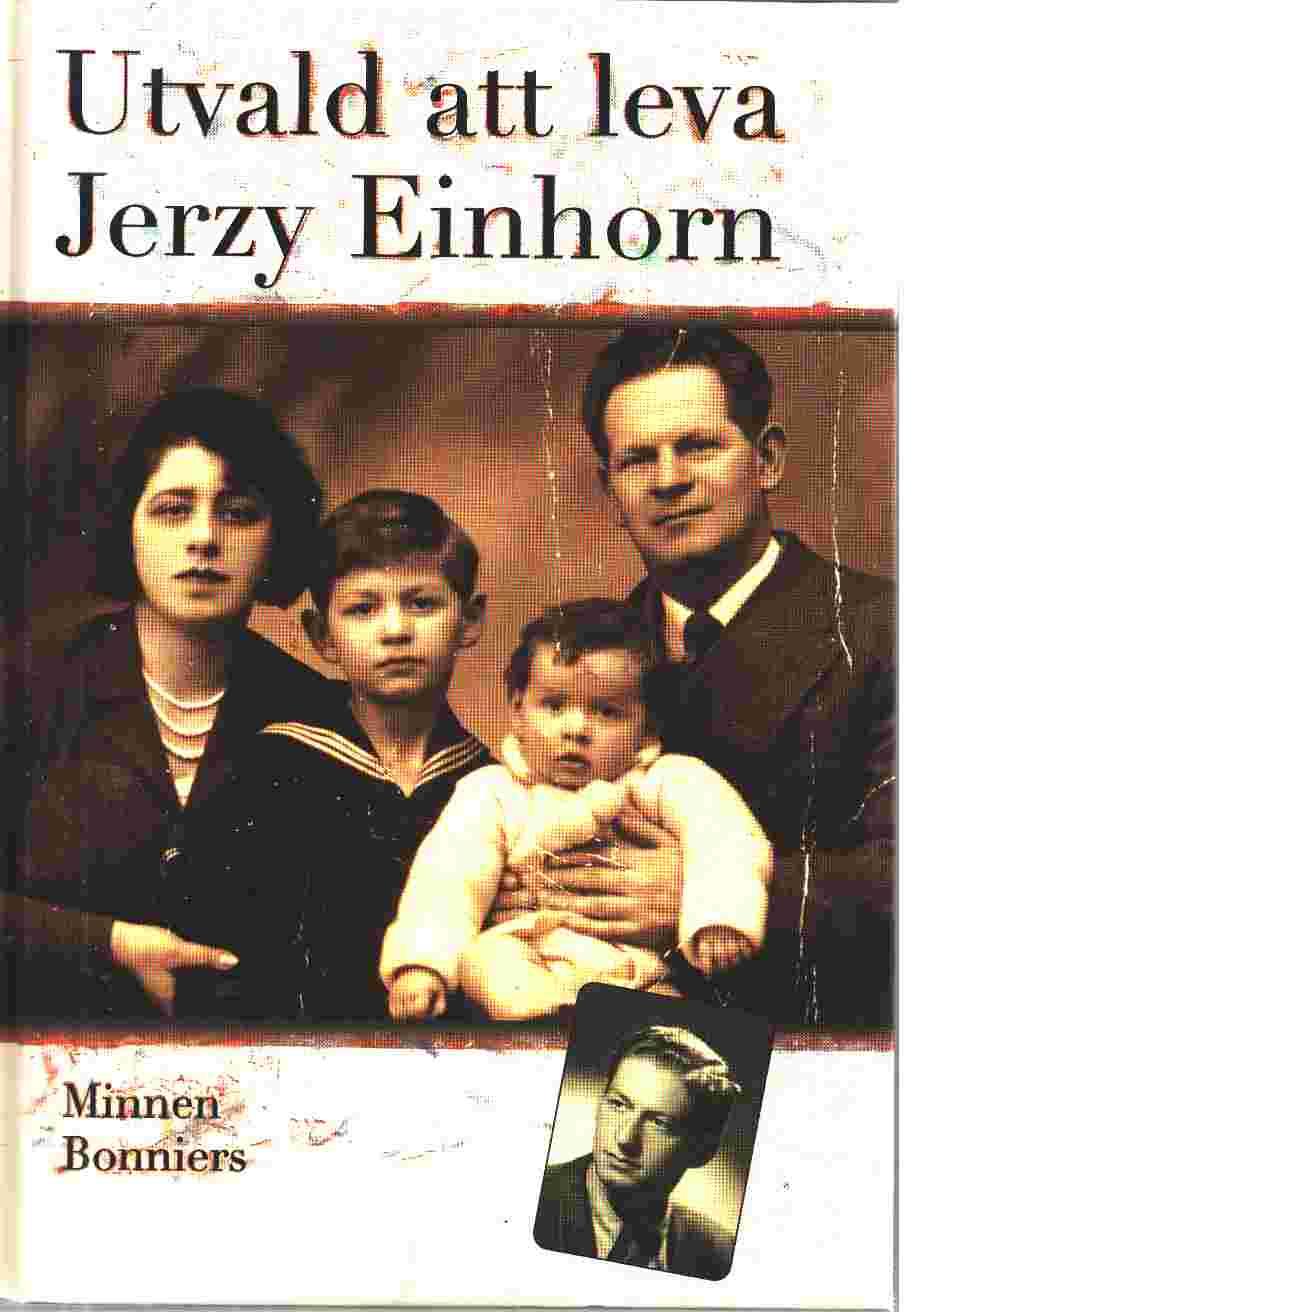 Utvald att leva : minnen - Einhorn, Jerzy